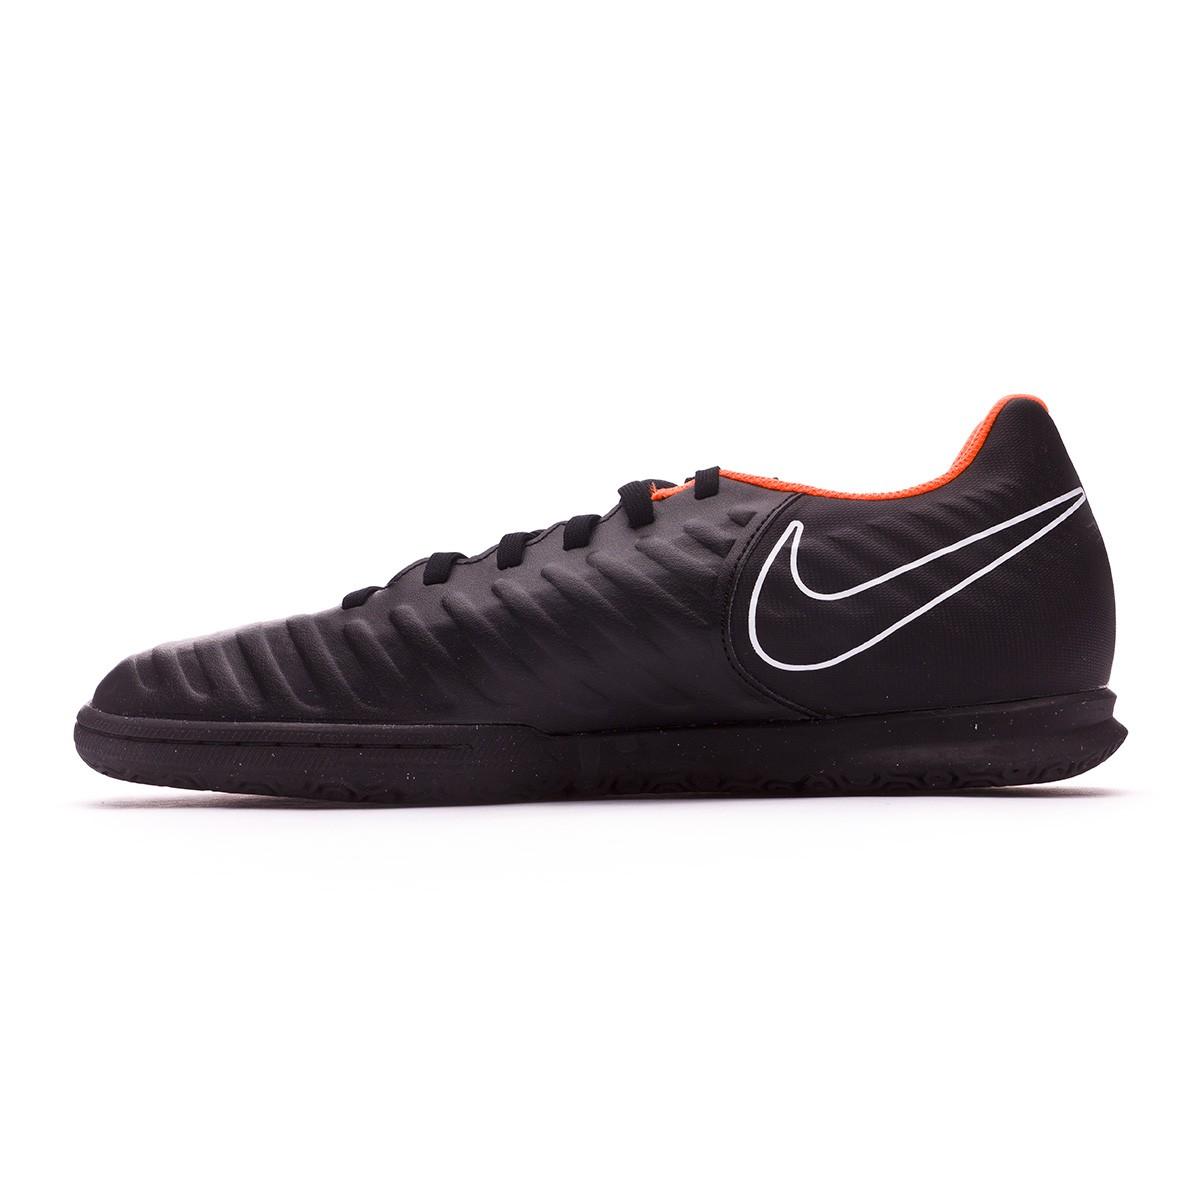 e08997fe054 Zapatilla Nike Tiempo LegendX VII Club IC Black-Total orange-White - Tienda  de fútbol Fútbol Emotion